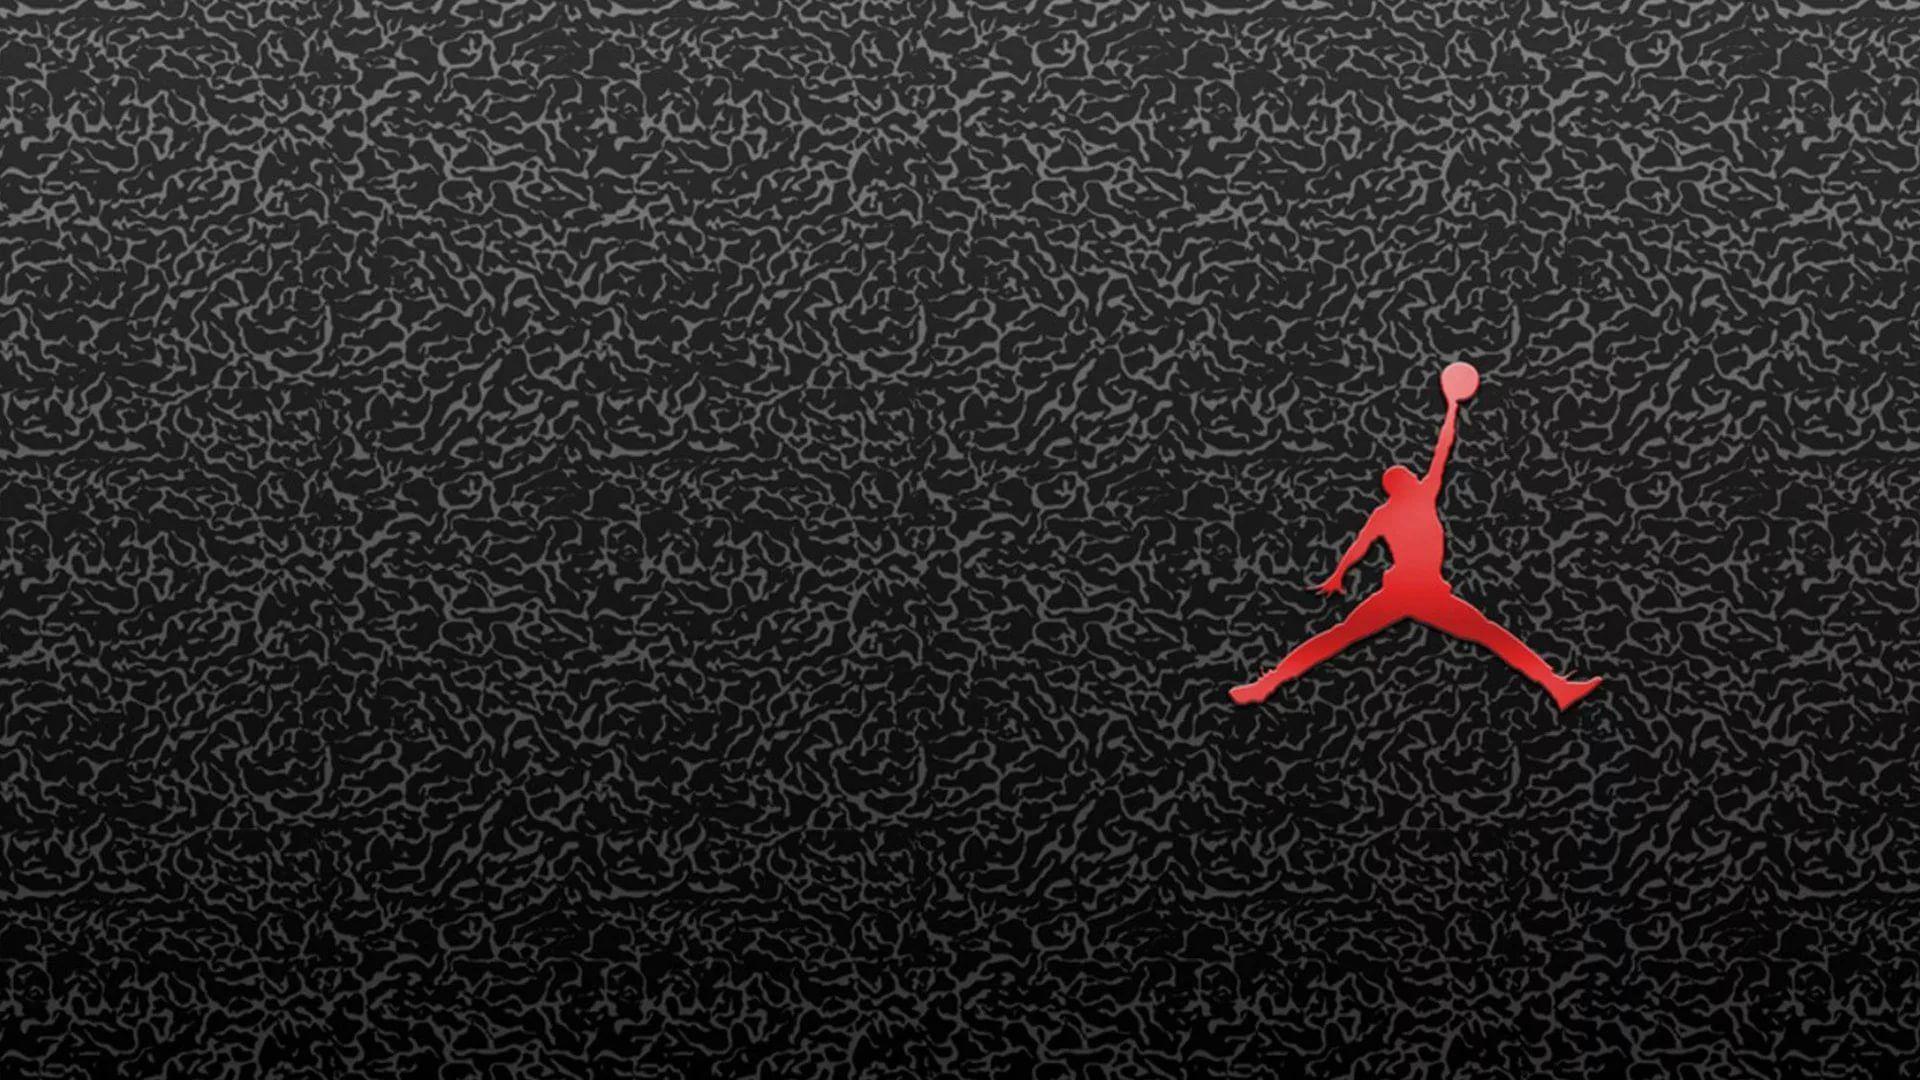 Jumpman Wallpaper